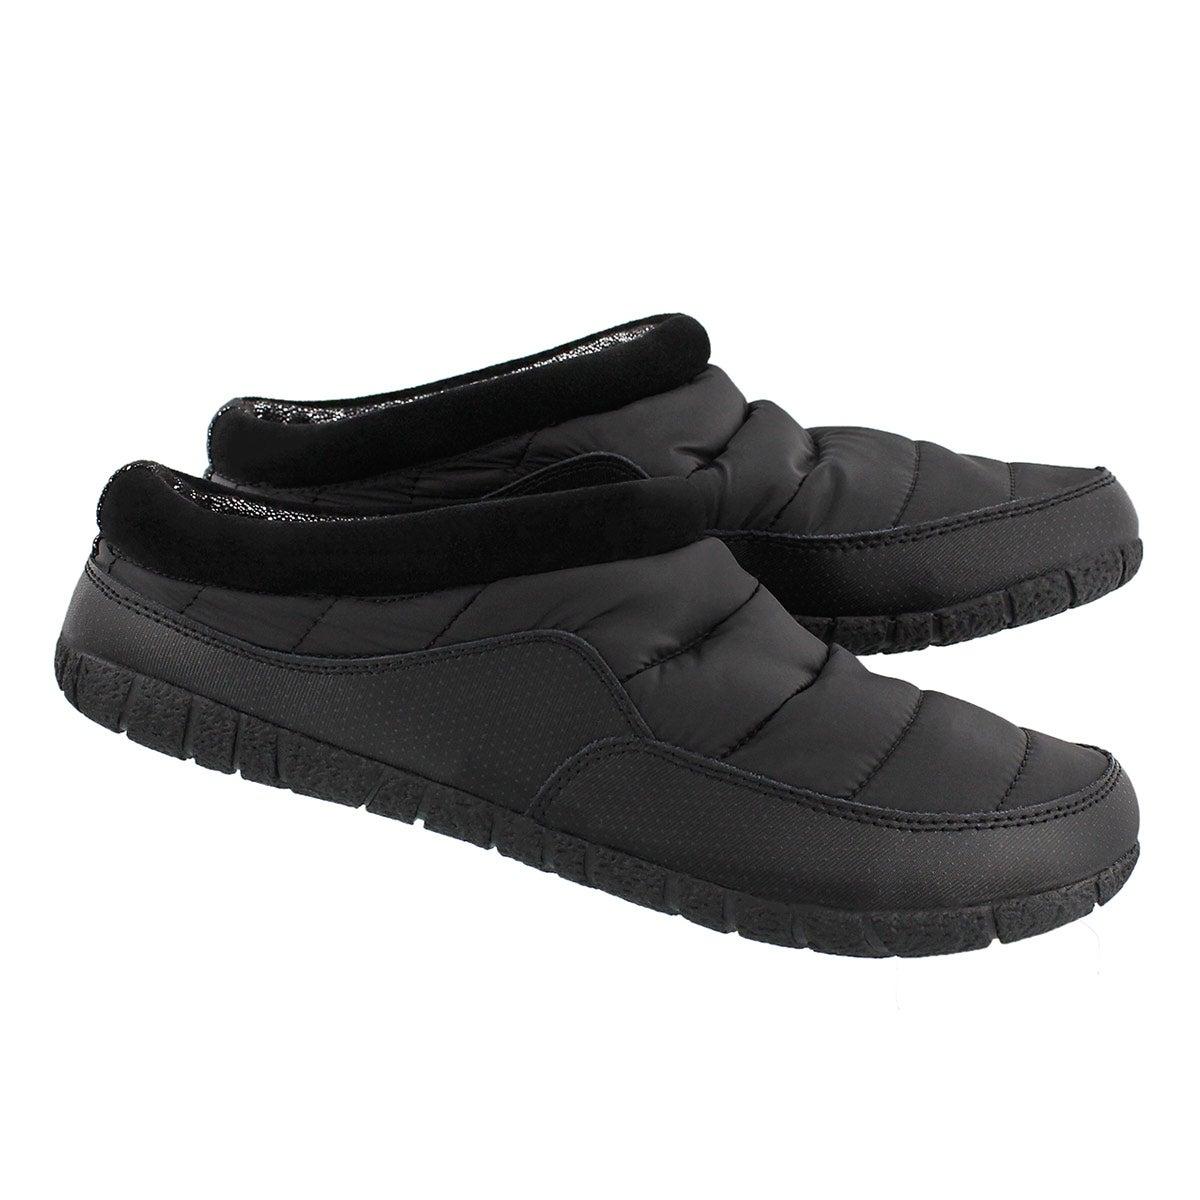 Mns Yukon black open back slipper